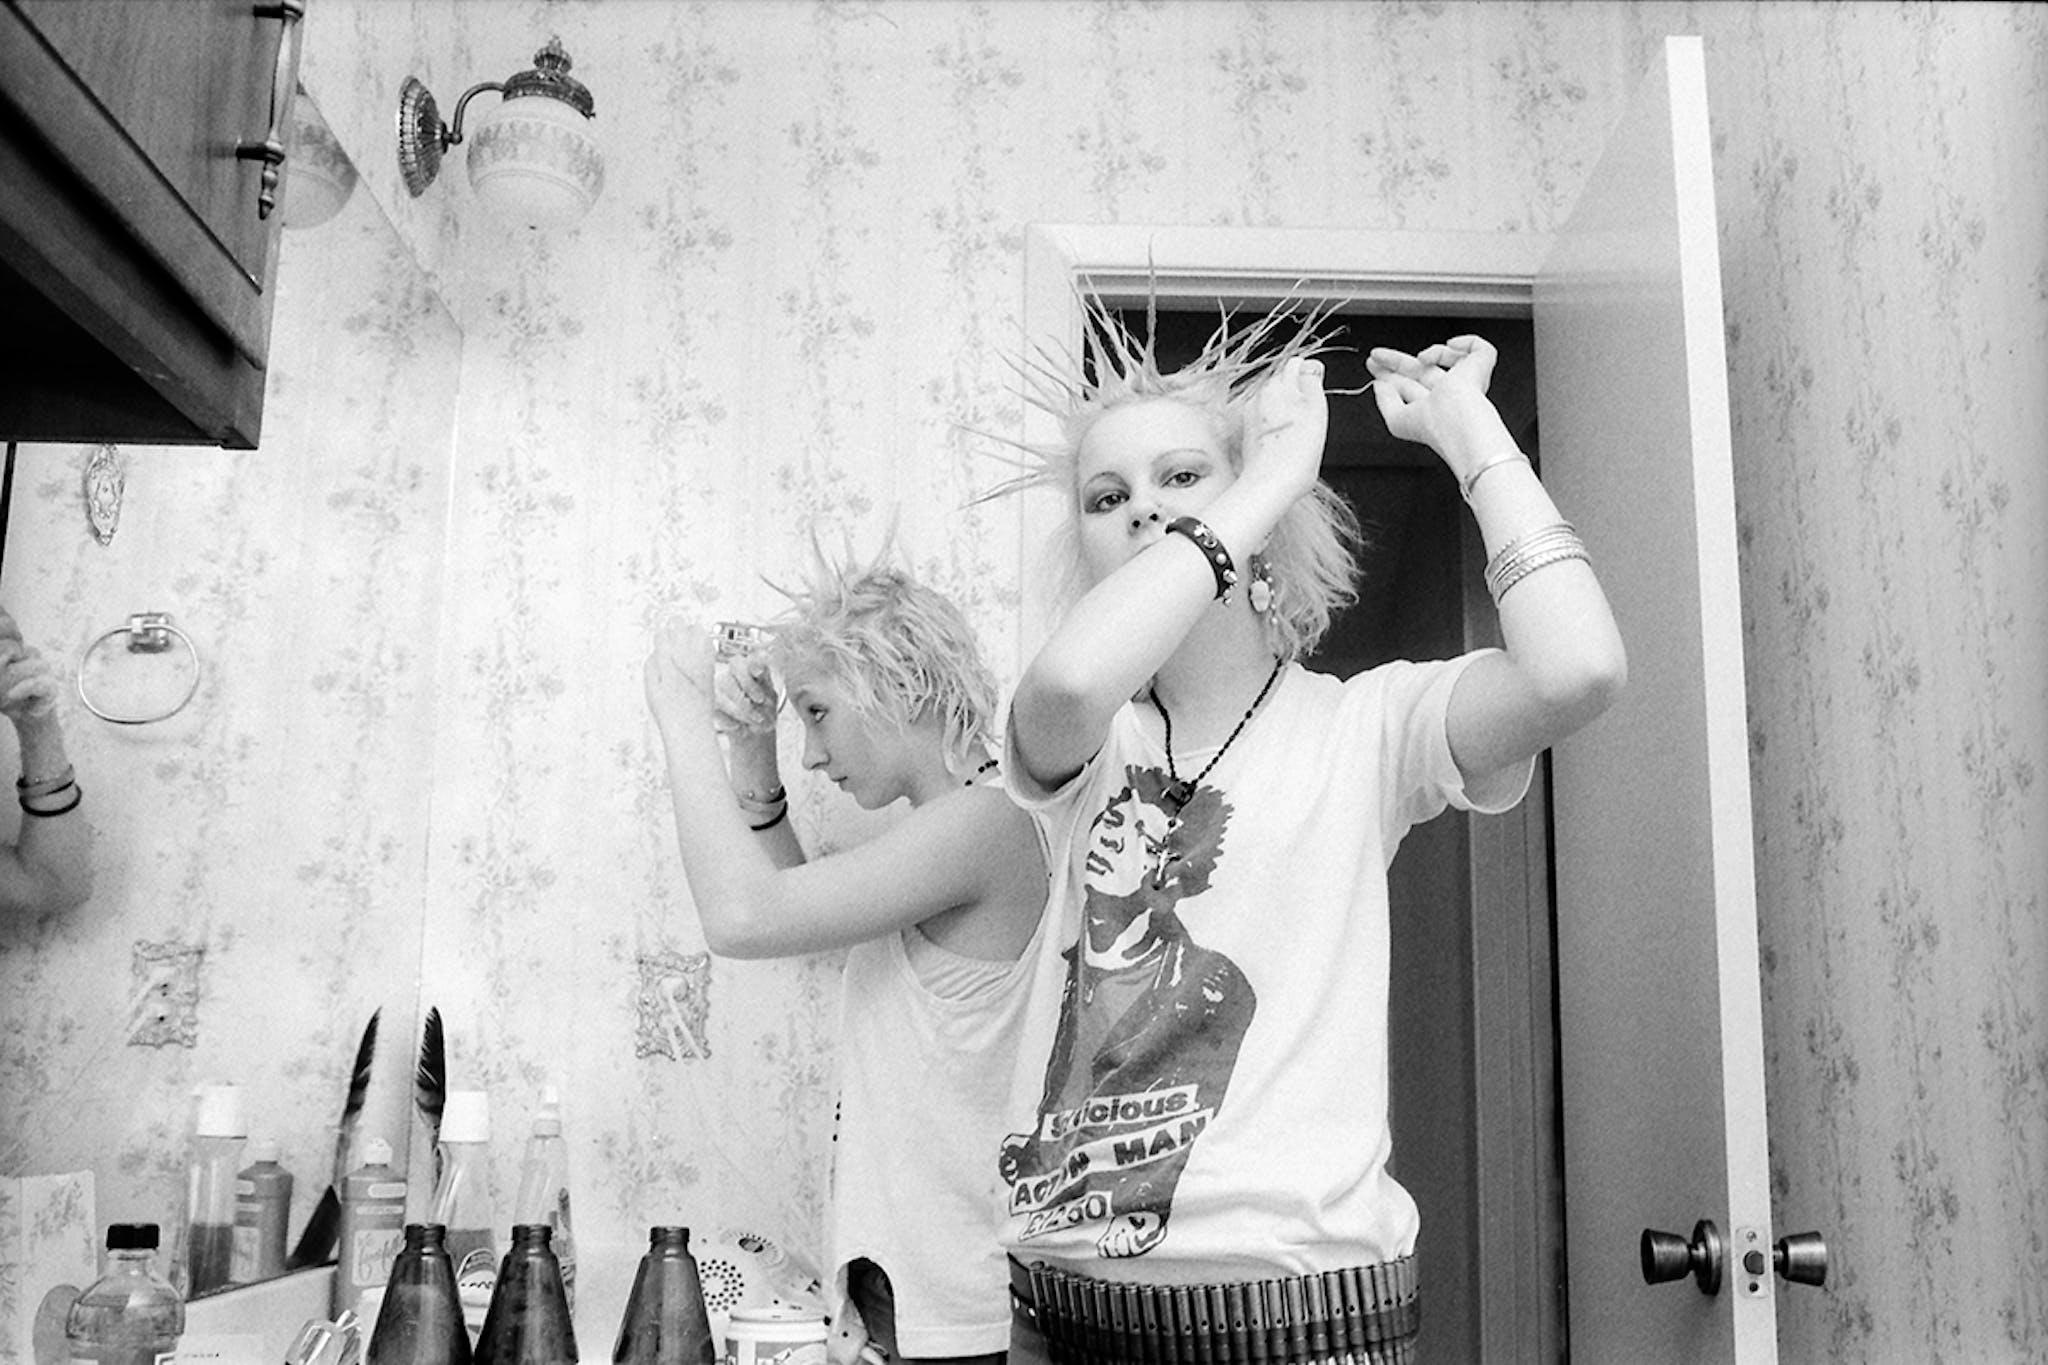 lynda-stuart-in-her-room-texas-punk